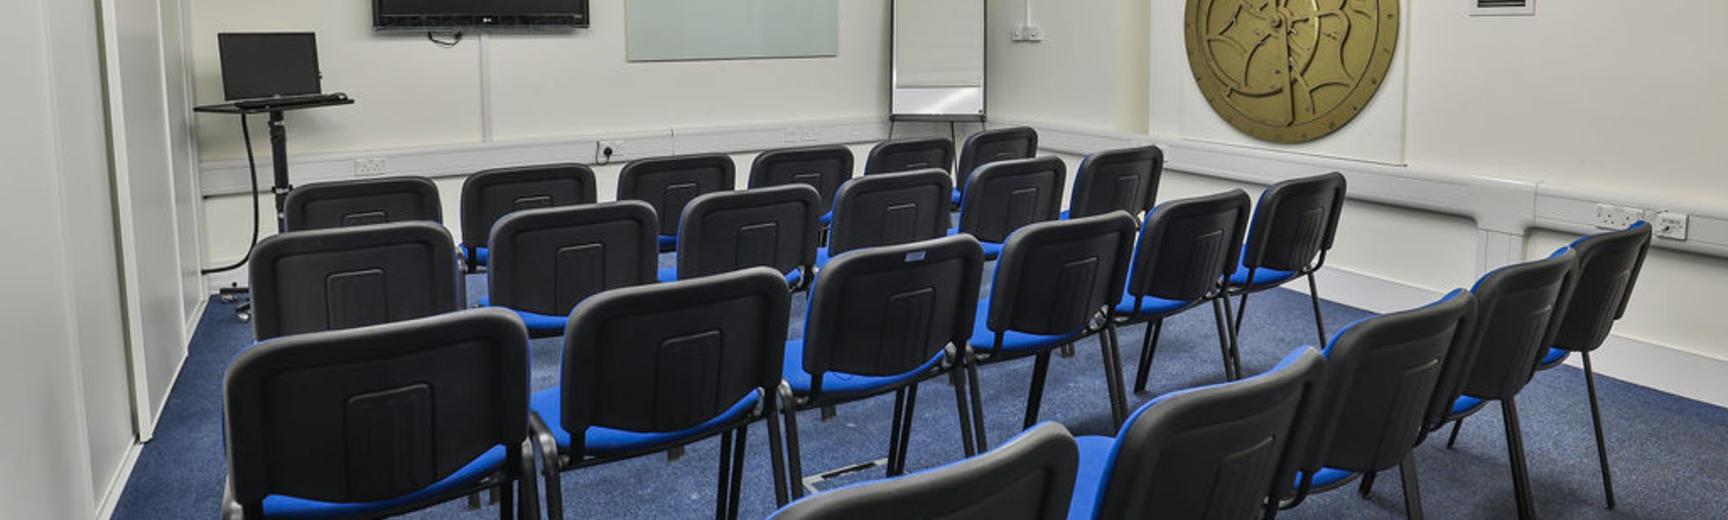 museumofhistoryofscience universityofoxford seminarroom 7300